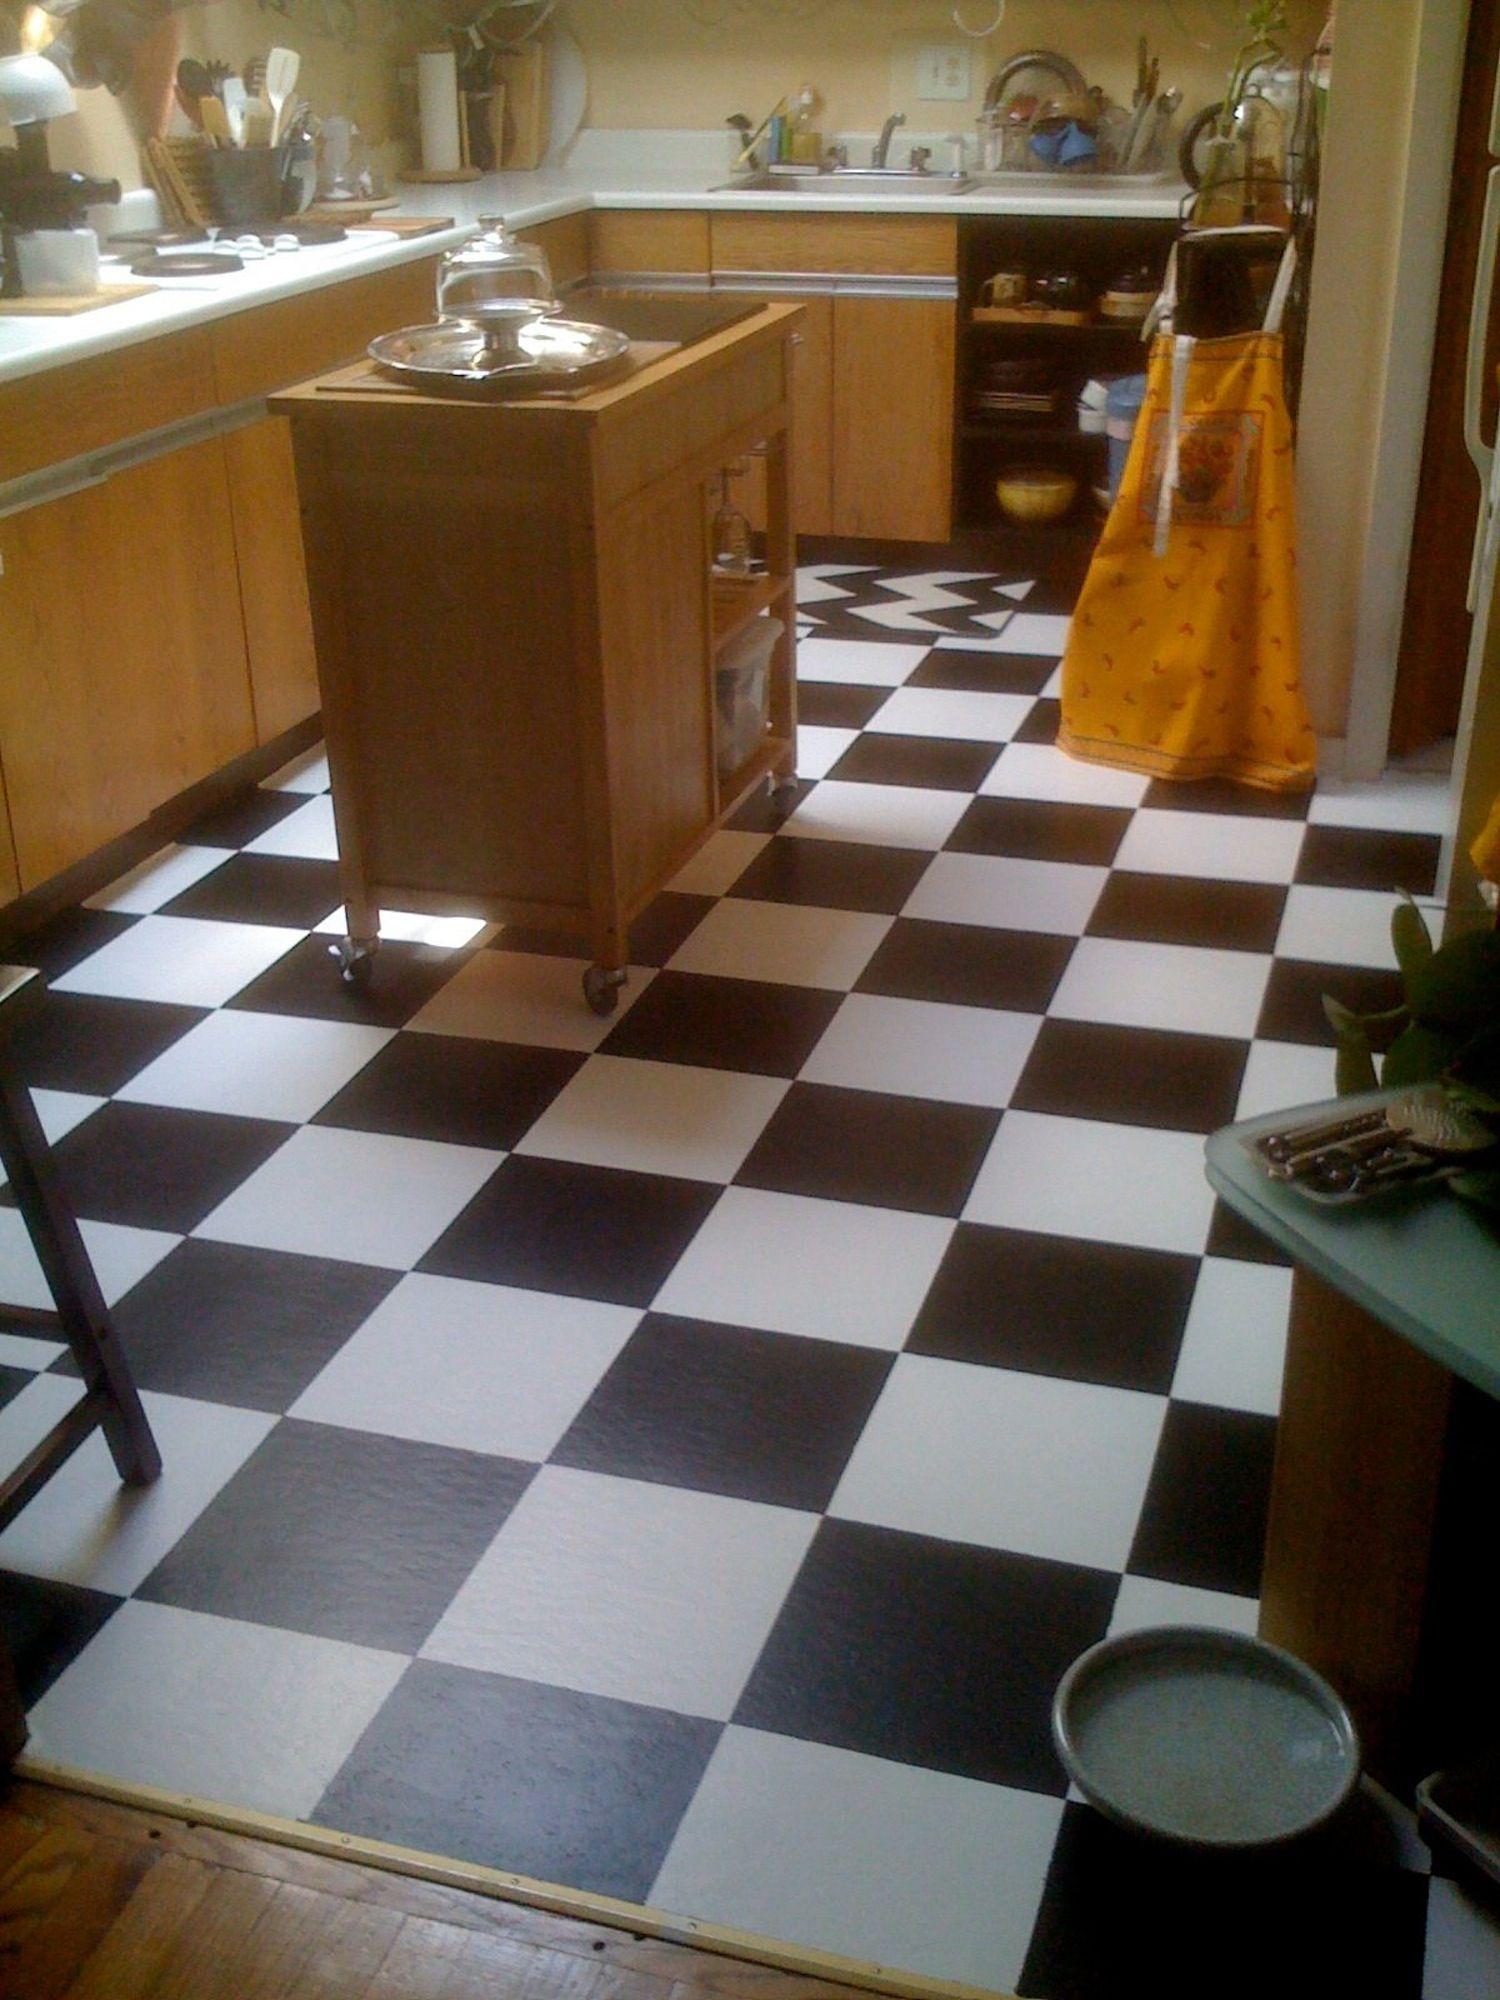 Floor Tile Decor Enchanting Diy Room Decor How To Paint Over Vinyl Floor Tiles  Diy Room Inspiration Design